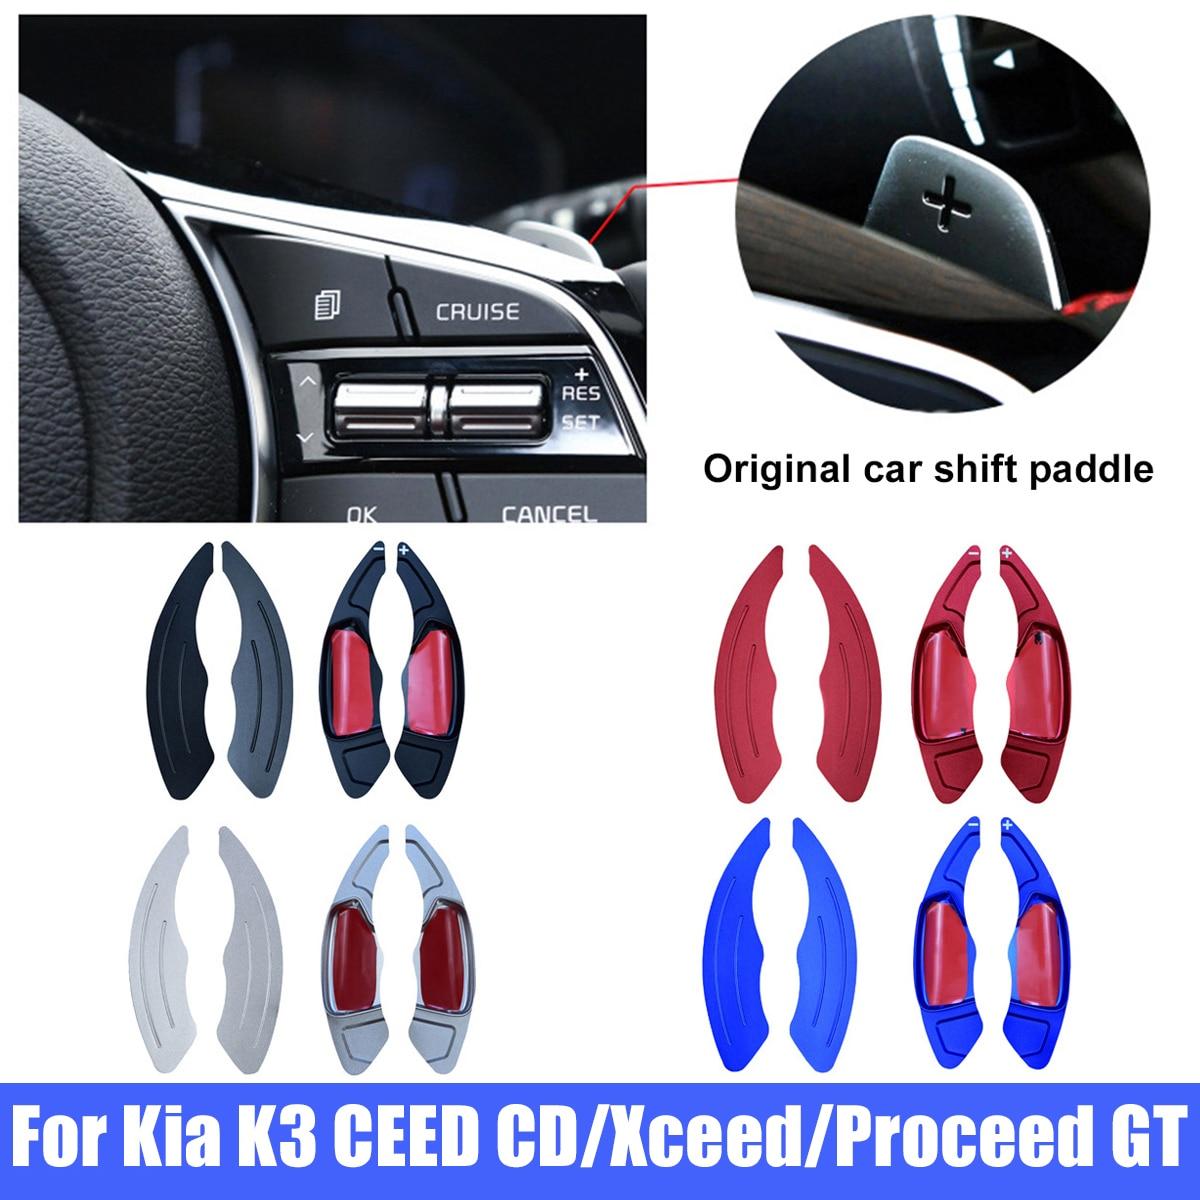 Весло рулевого переключения для Kia K3 CEED CD Xceed продолжить GT, 2 шт.